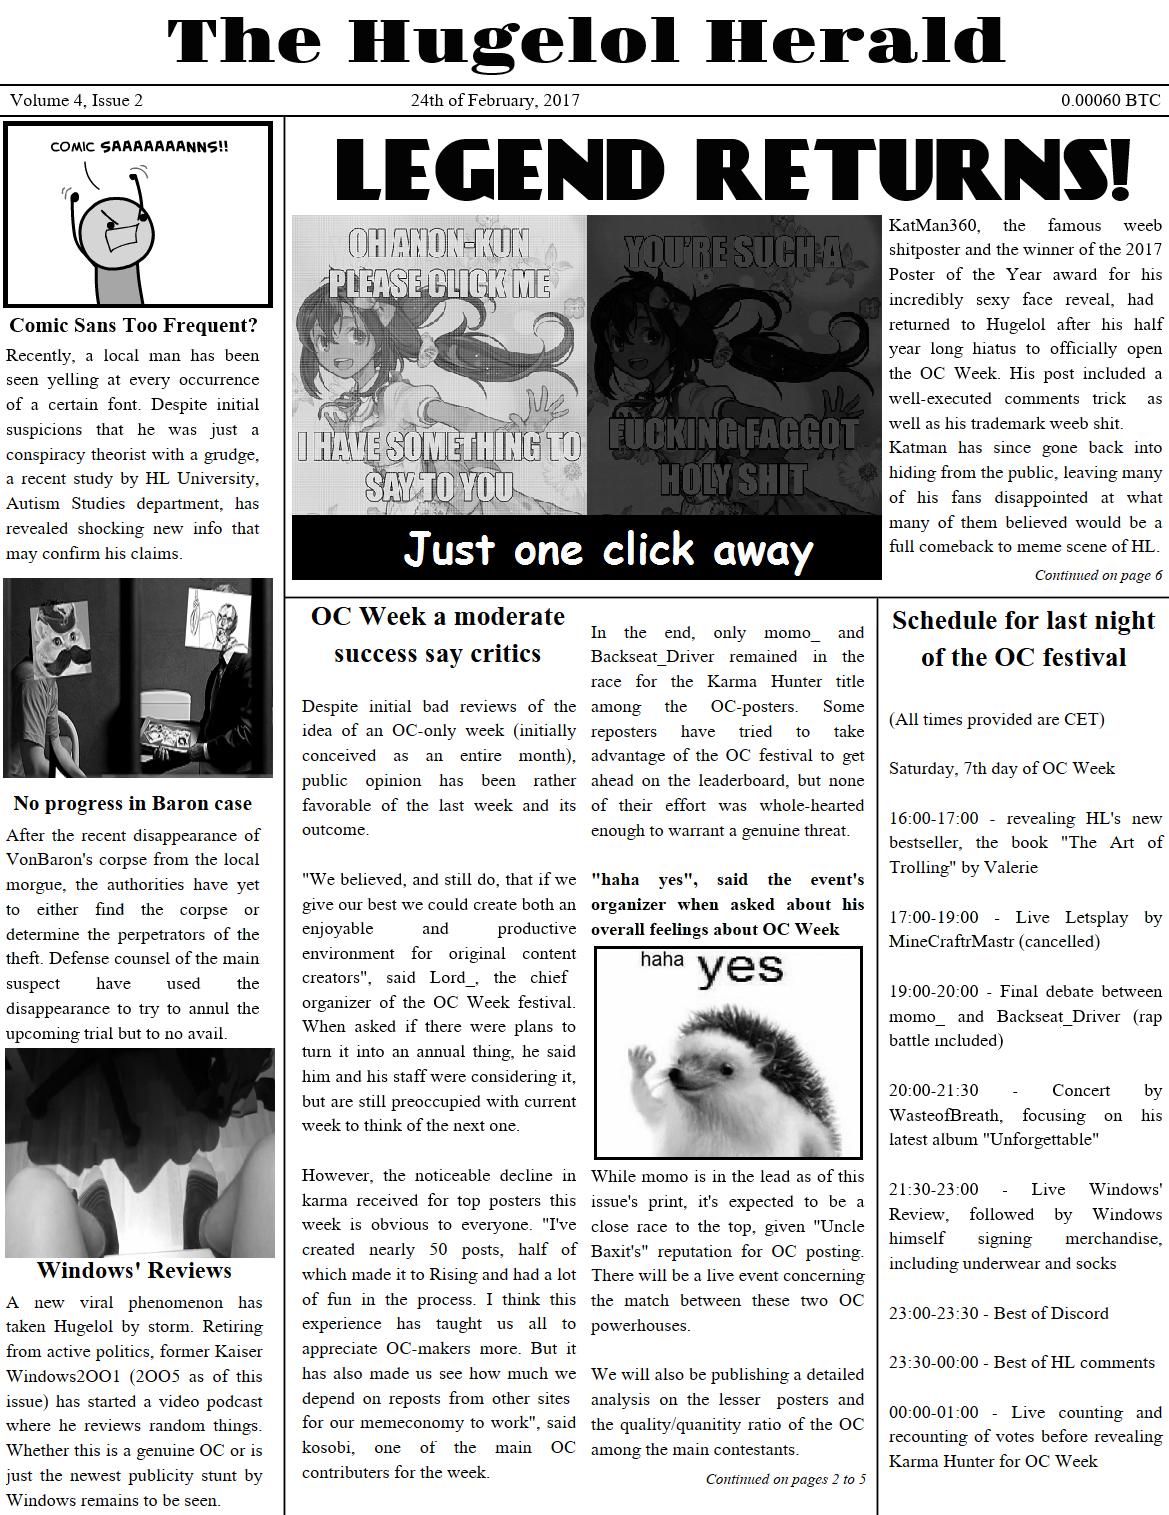 Hugelol Herald, OC Week edition